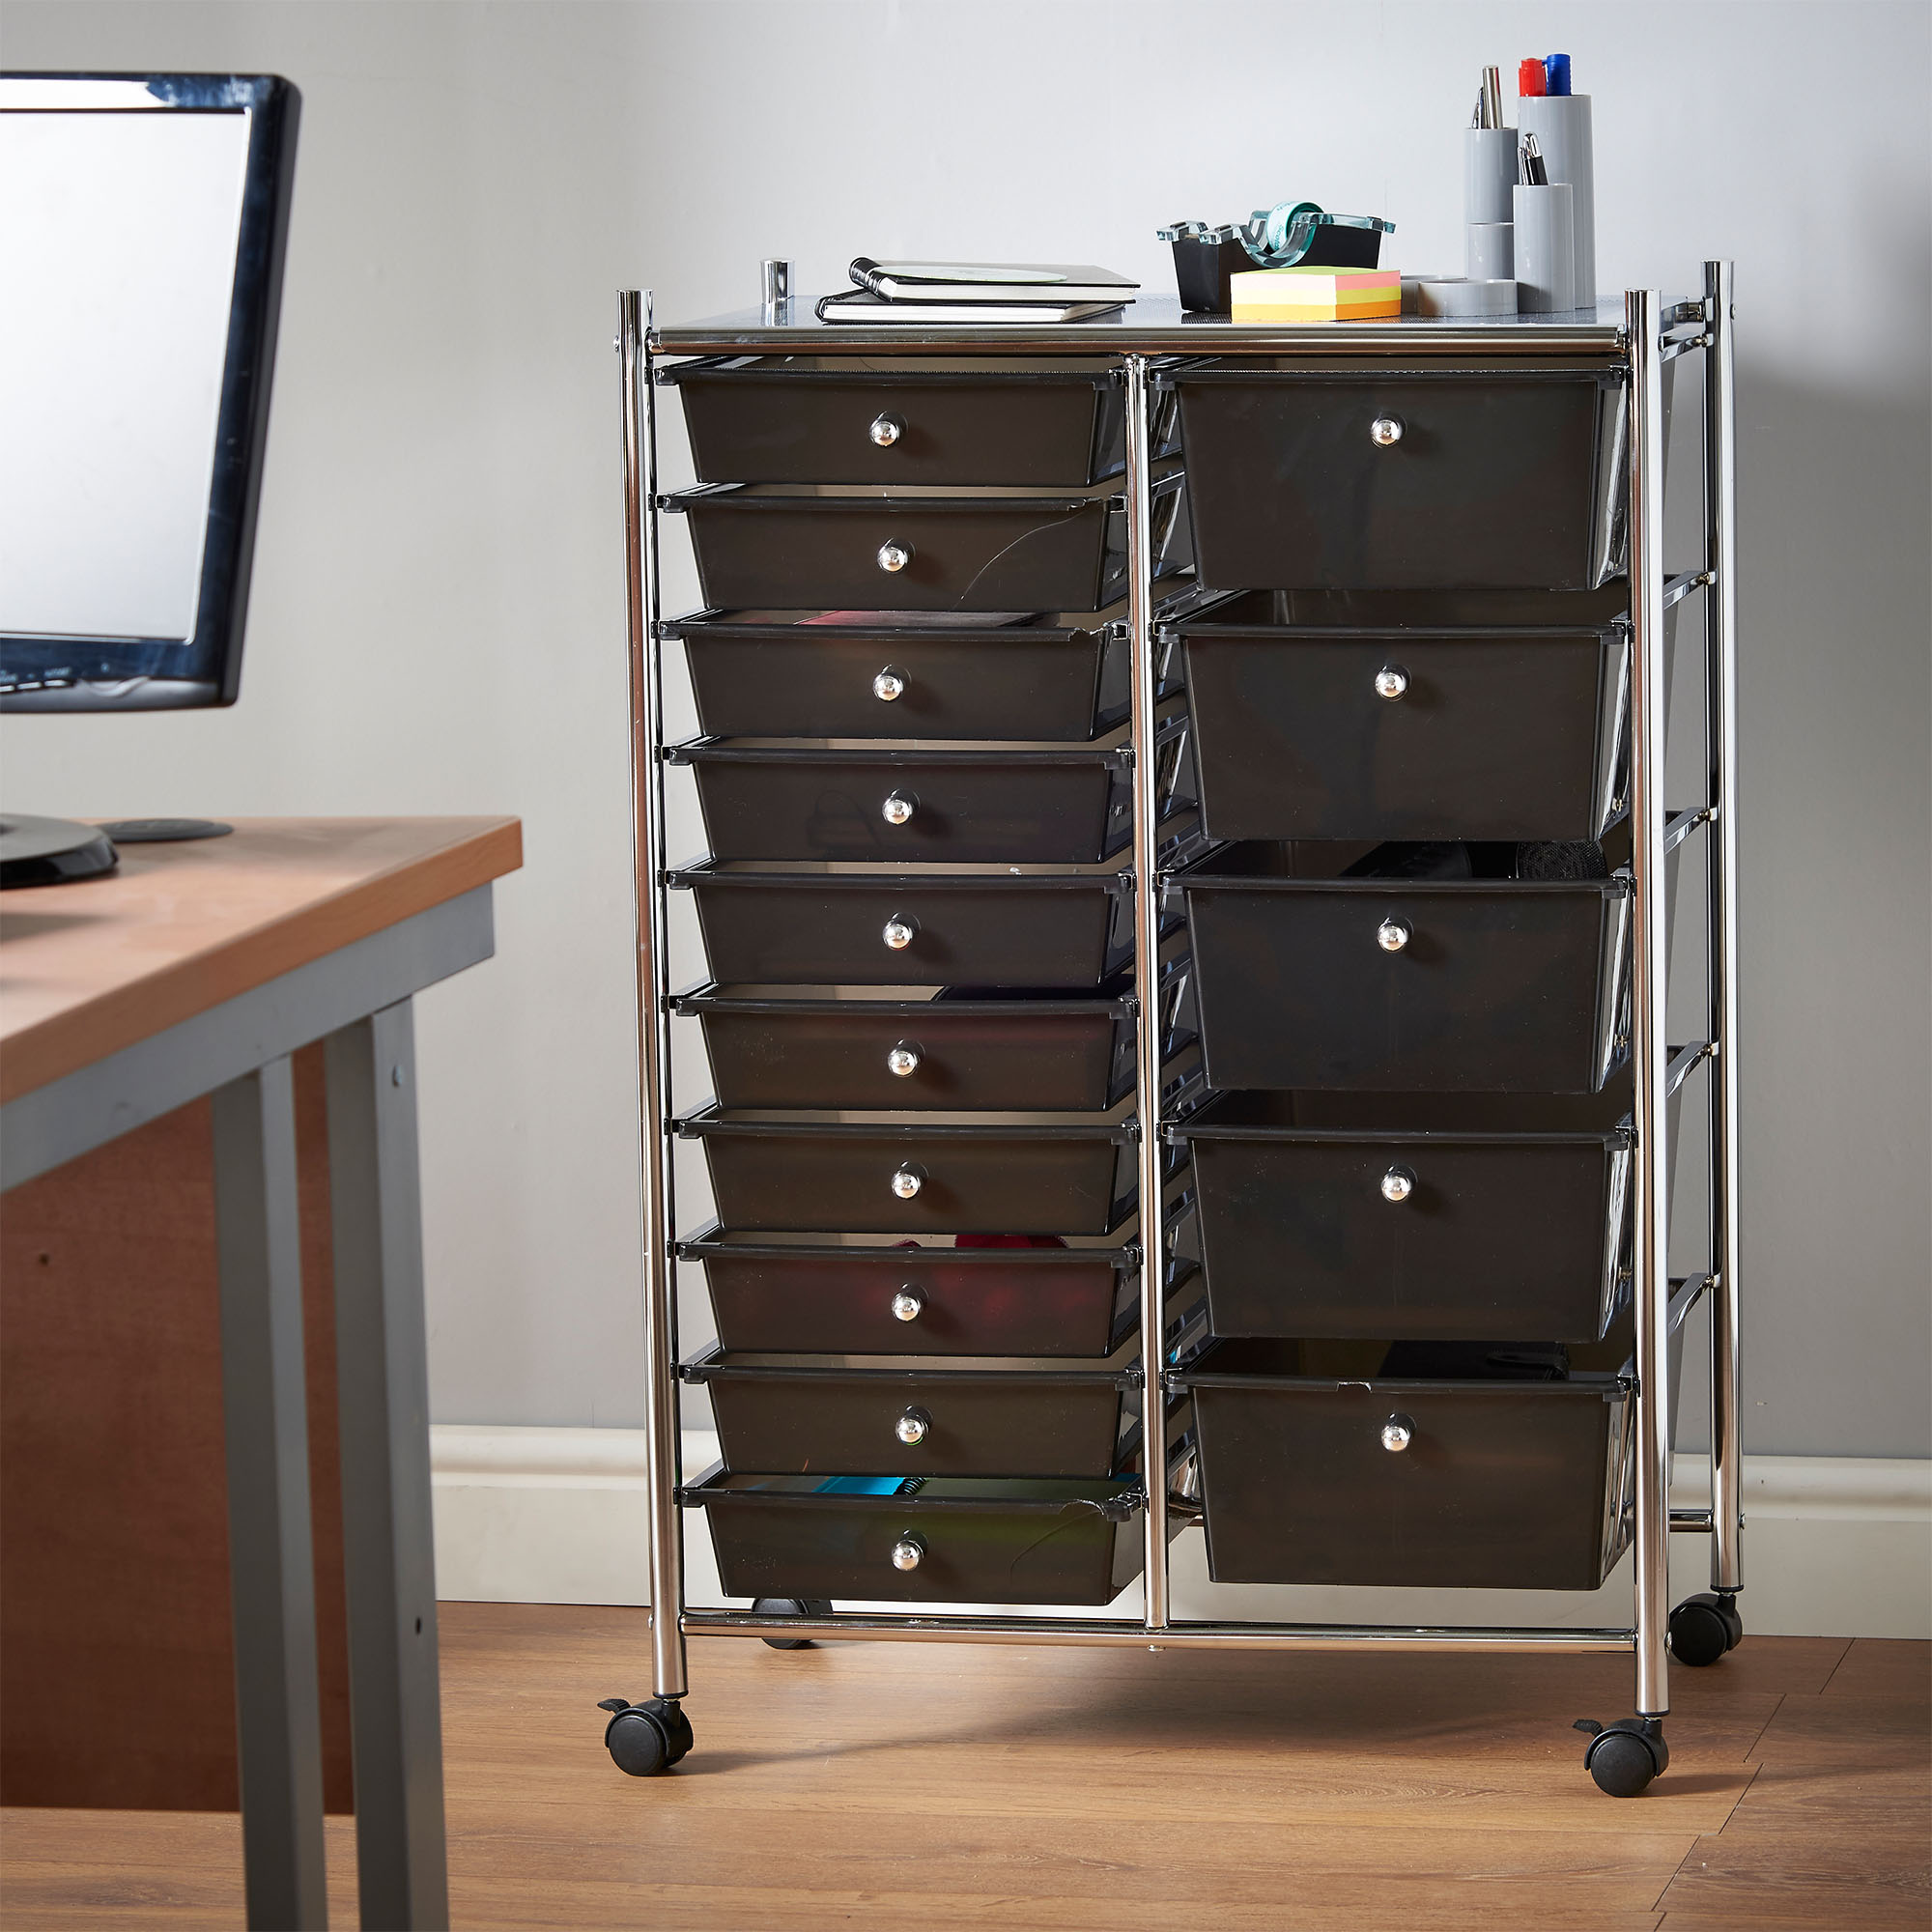 VonHaus Black 15 Drawer Home Office Salon Make Up Mobile